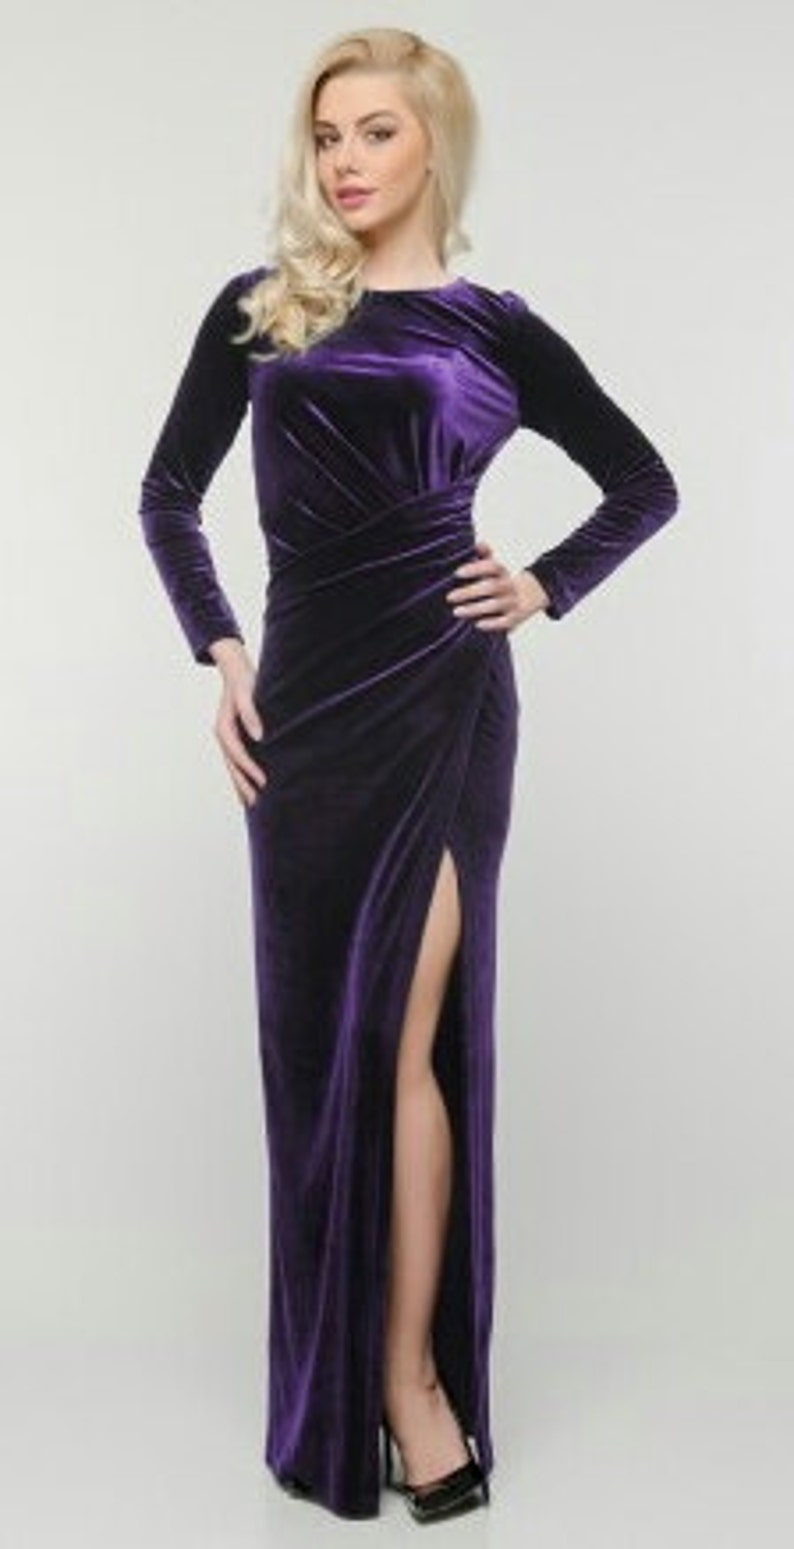 a777c1694ac470 Lange jurk van fluweel Maxi dress paars fluwelen